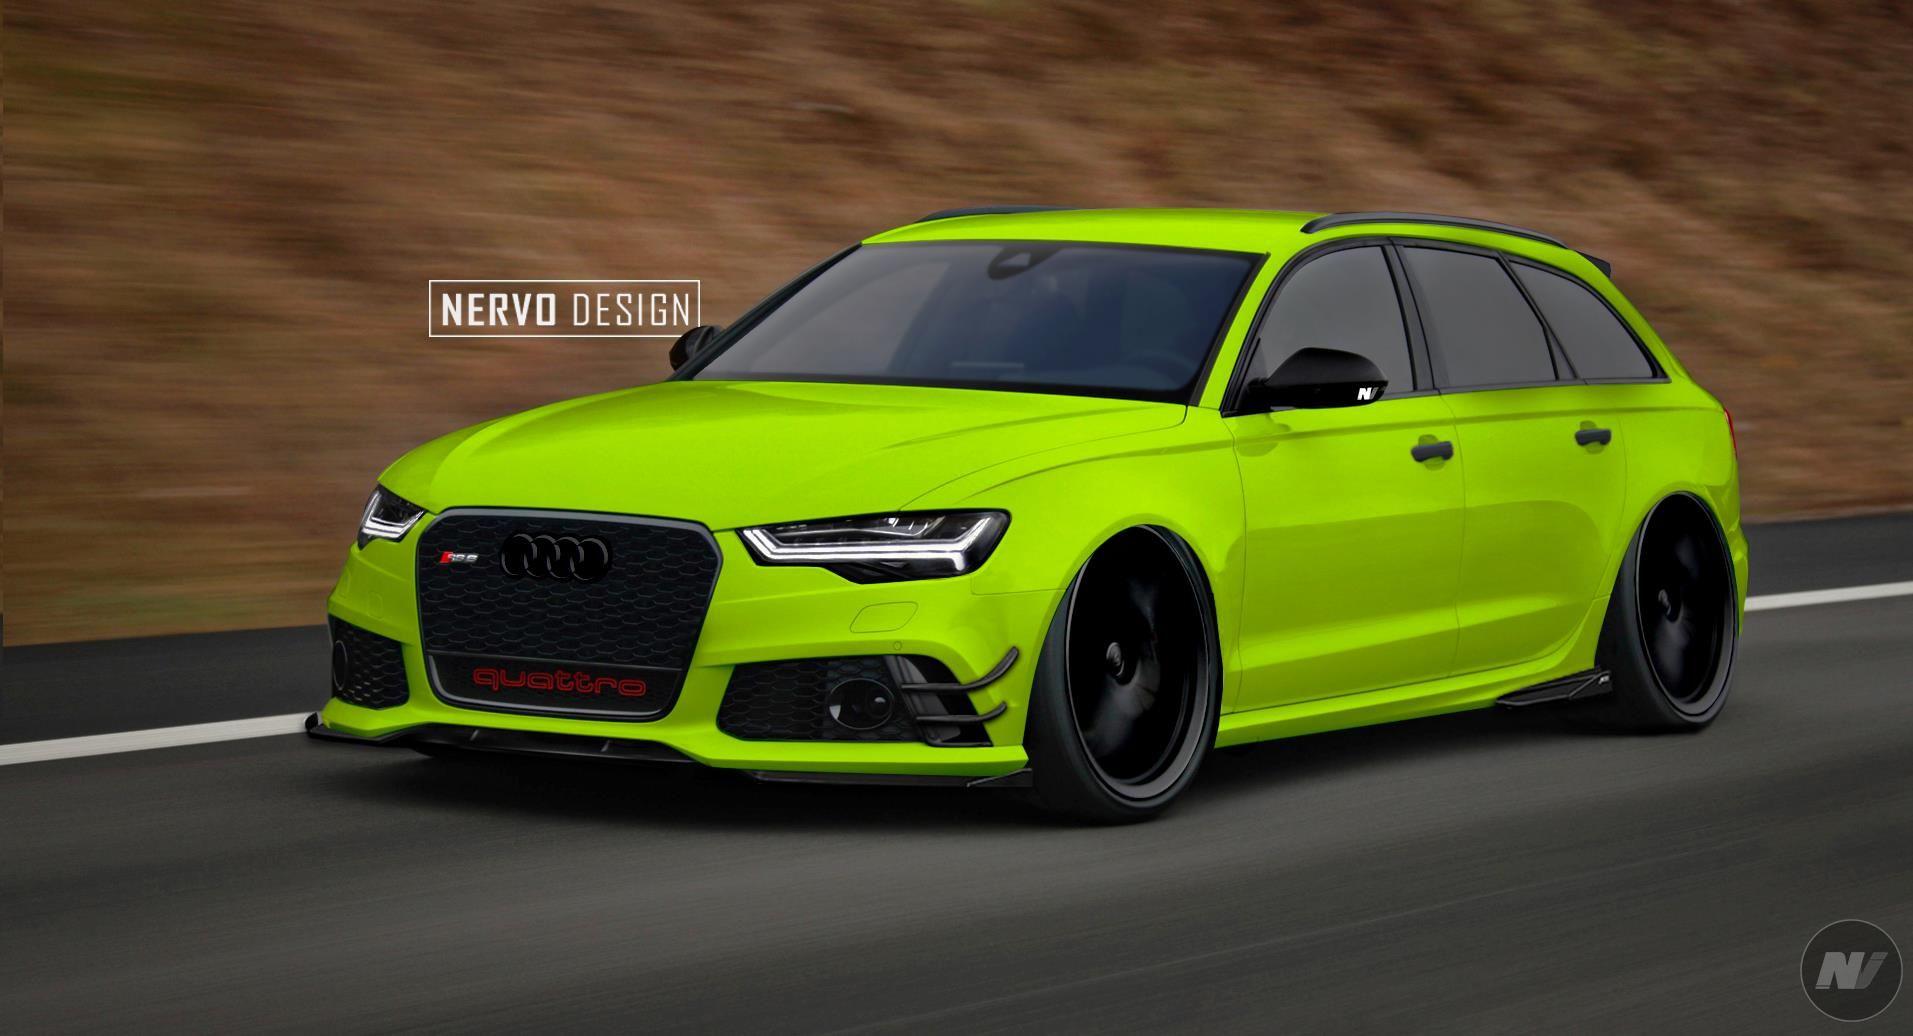 Audi Rs6 Audi Pinterest Audi Rs6 Audi And Design